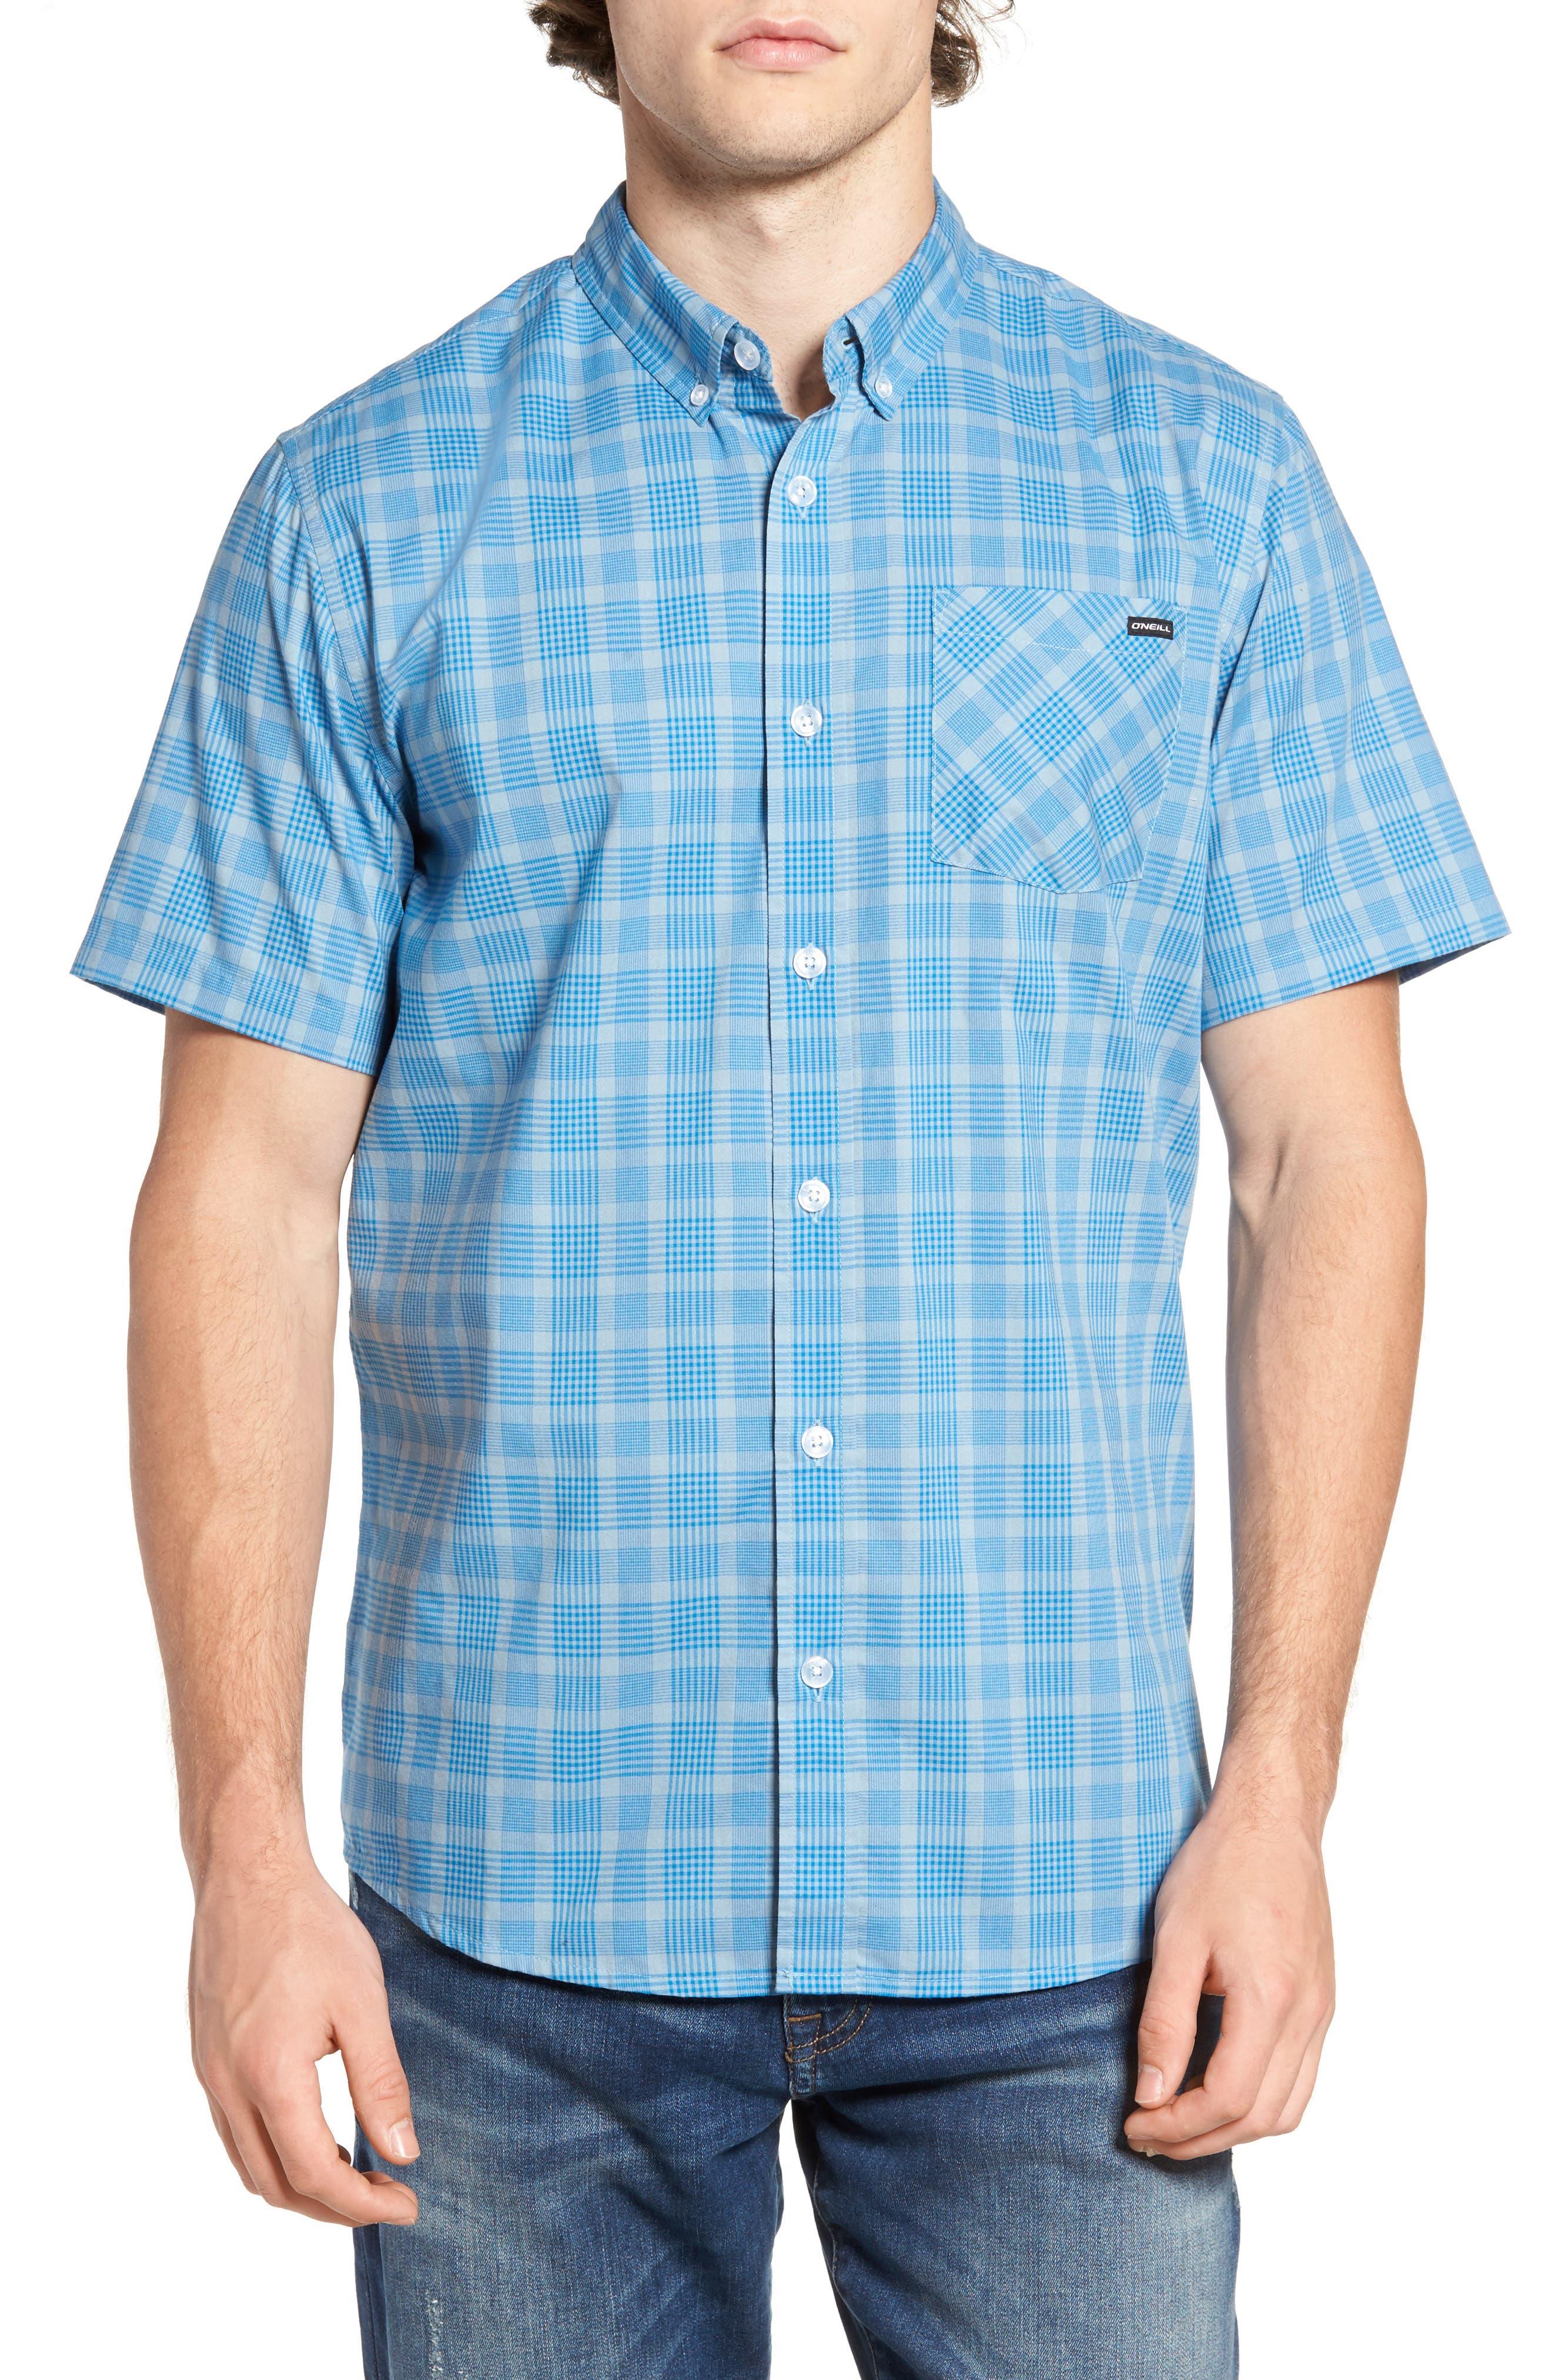 O'Neill Check Woven Shirt